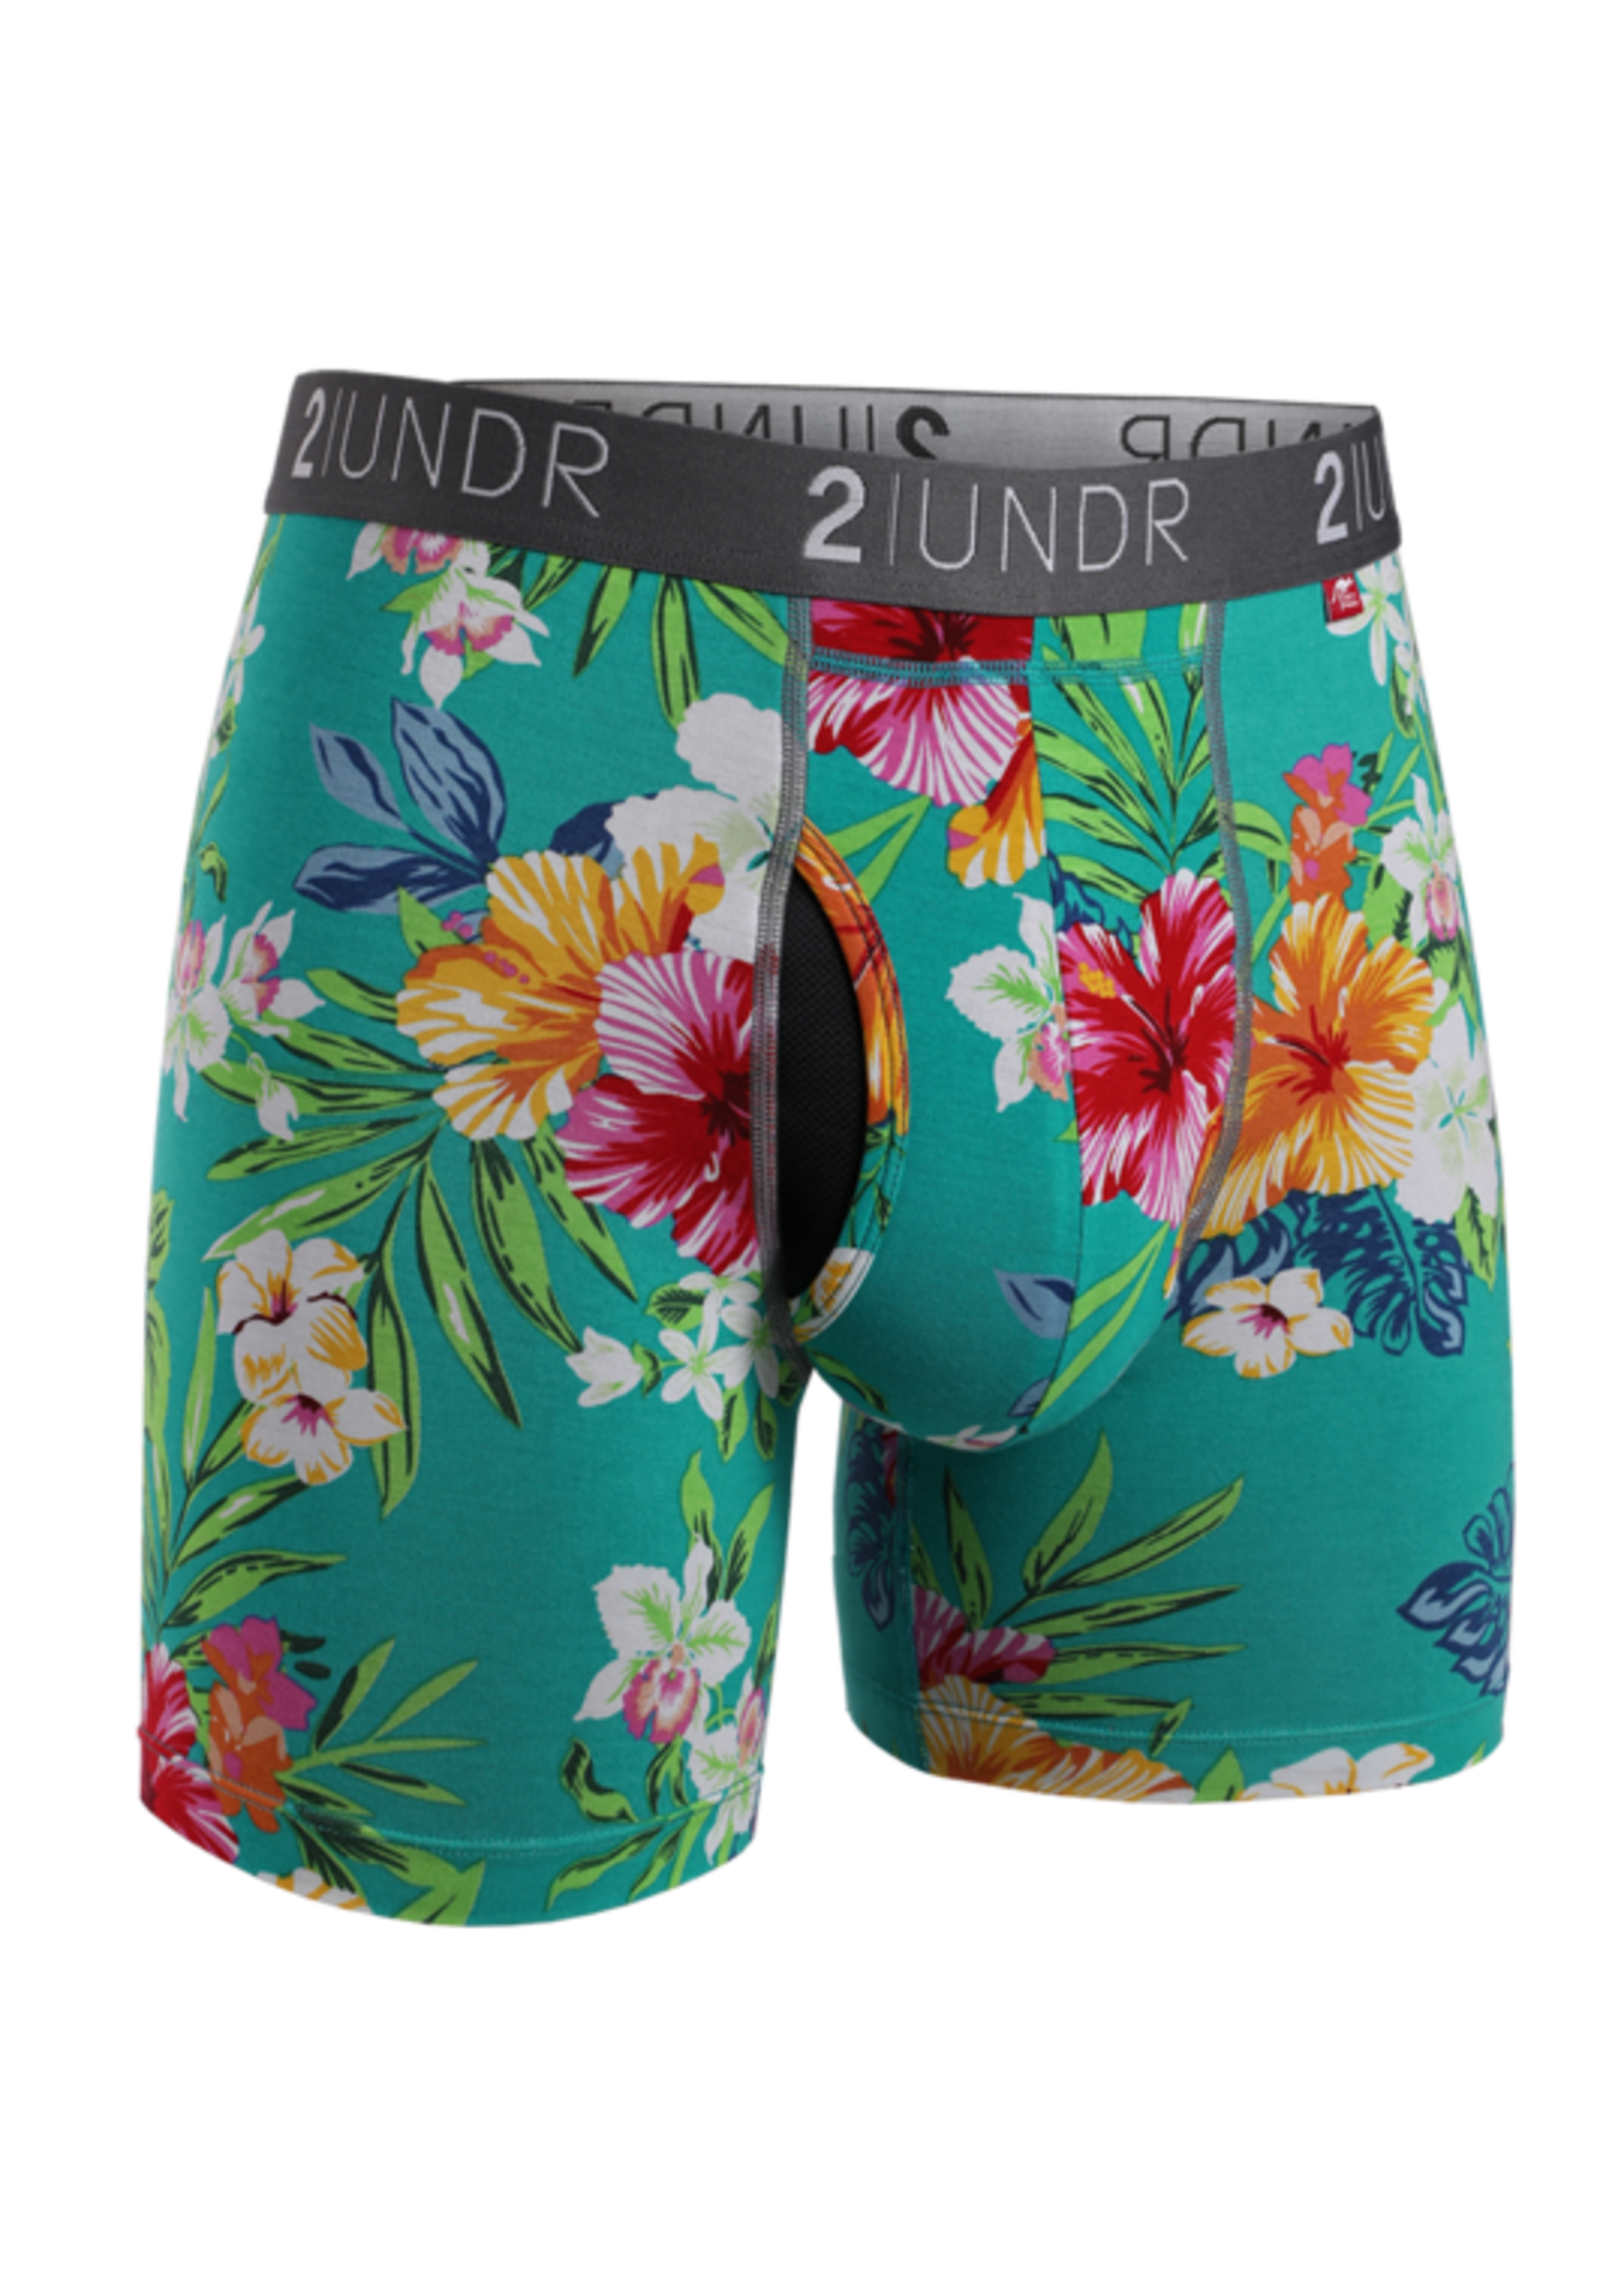 "2UNDR 2UNDR's ""Kona / Turks"" Swing Shift Boxer Brief Two Pack"